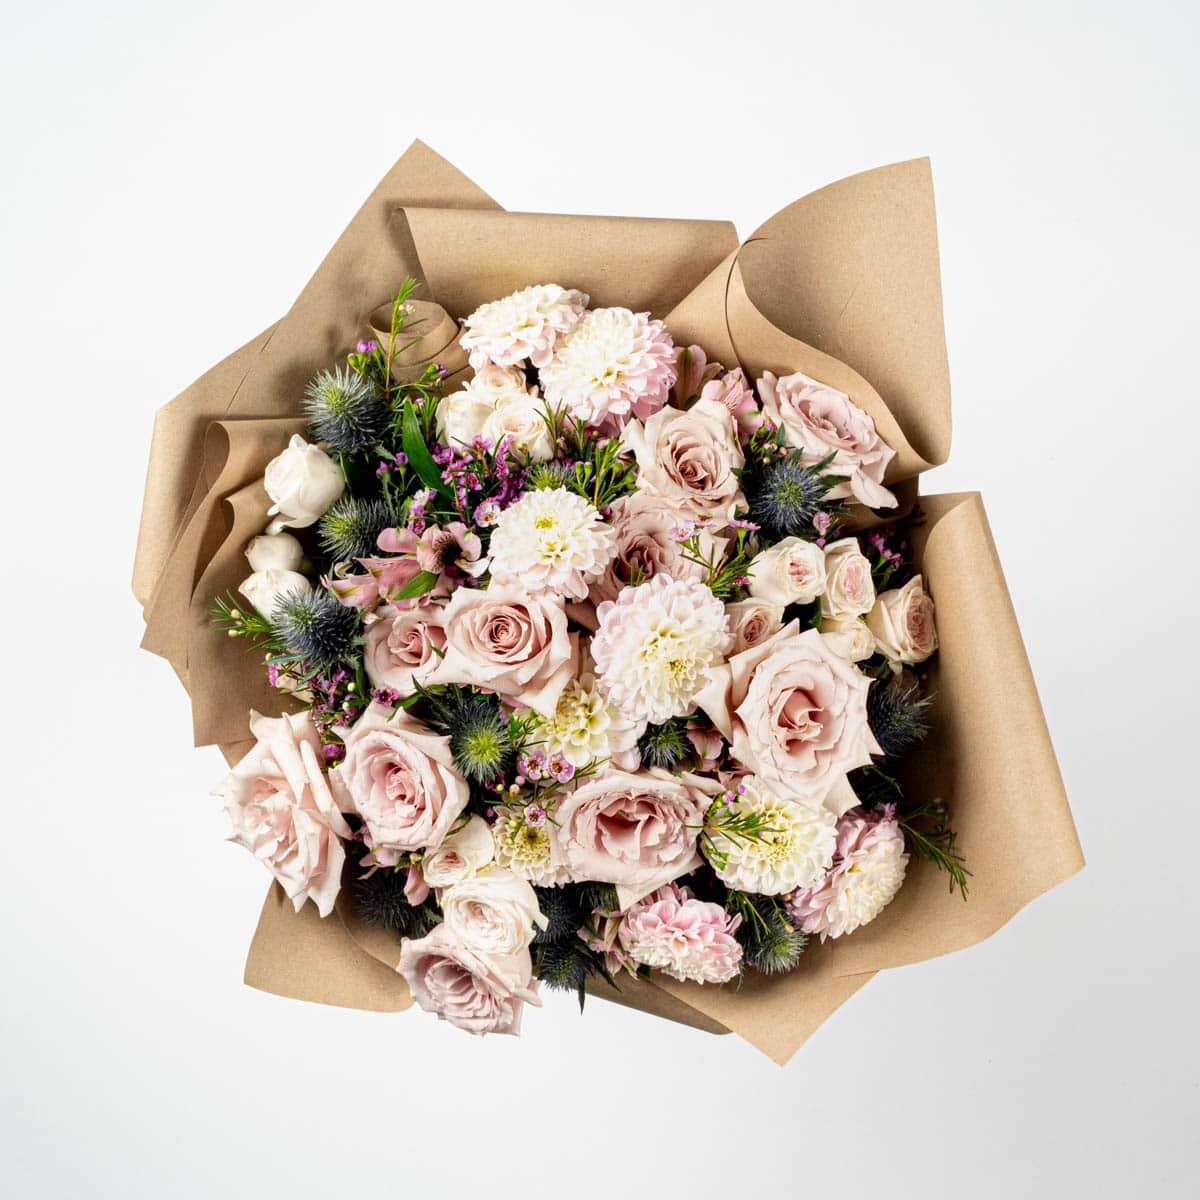 Bloom Flower Delivery | Caramel Mirage Bouquet